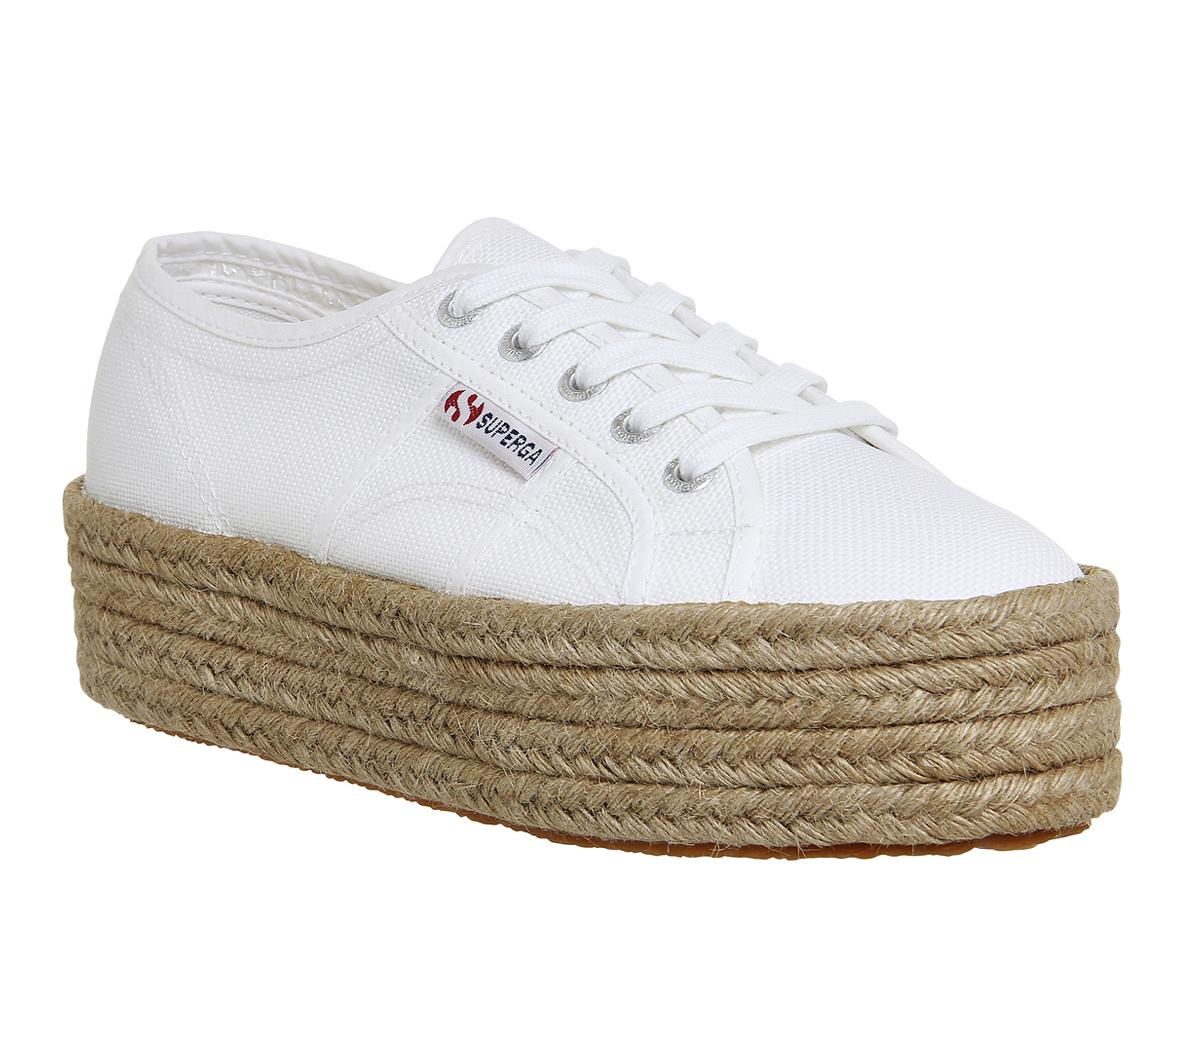 Superga 2790 White Espadrille - Hers